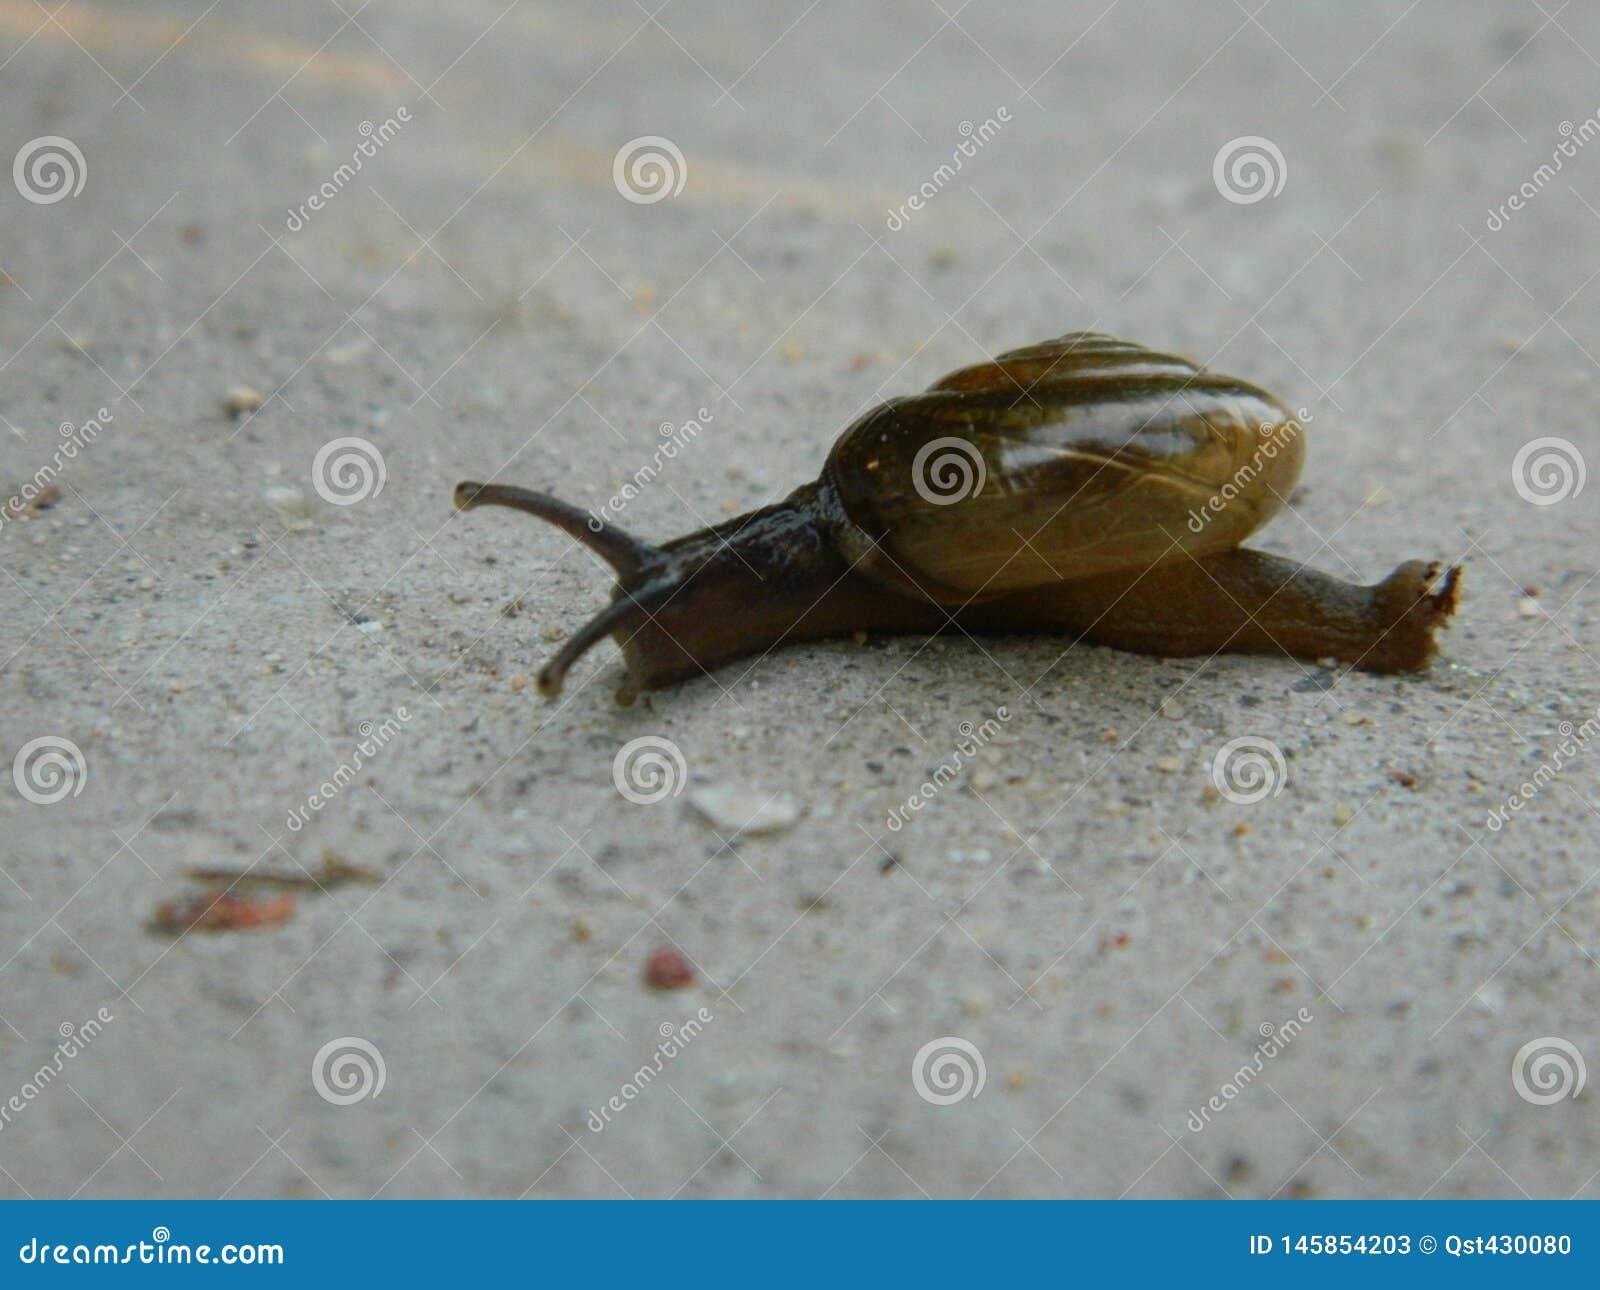 A snail crawling slowly